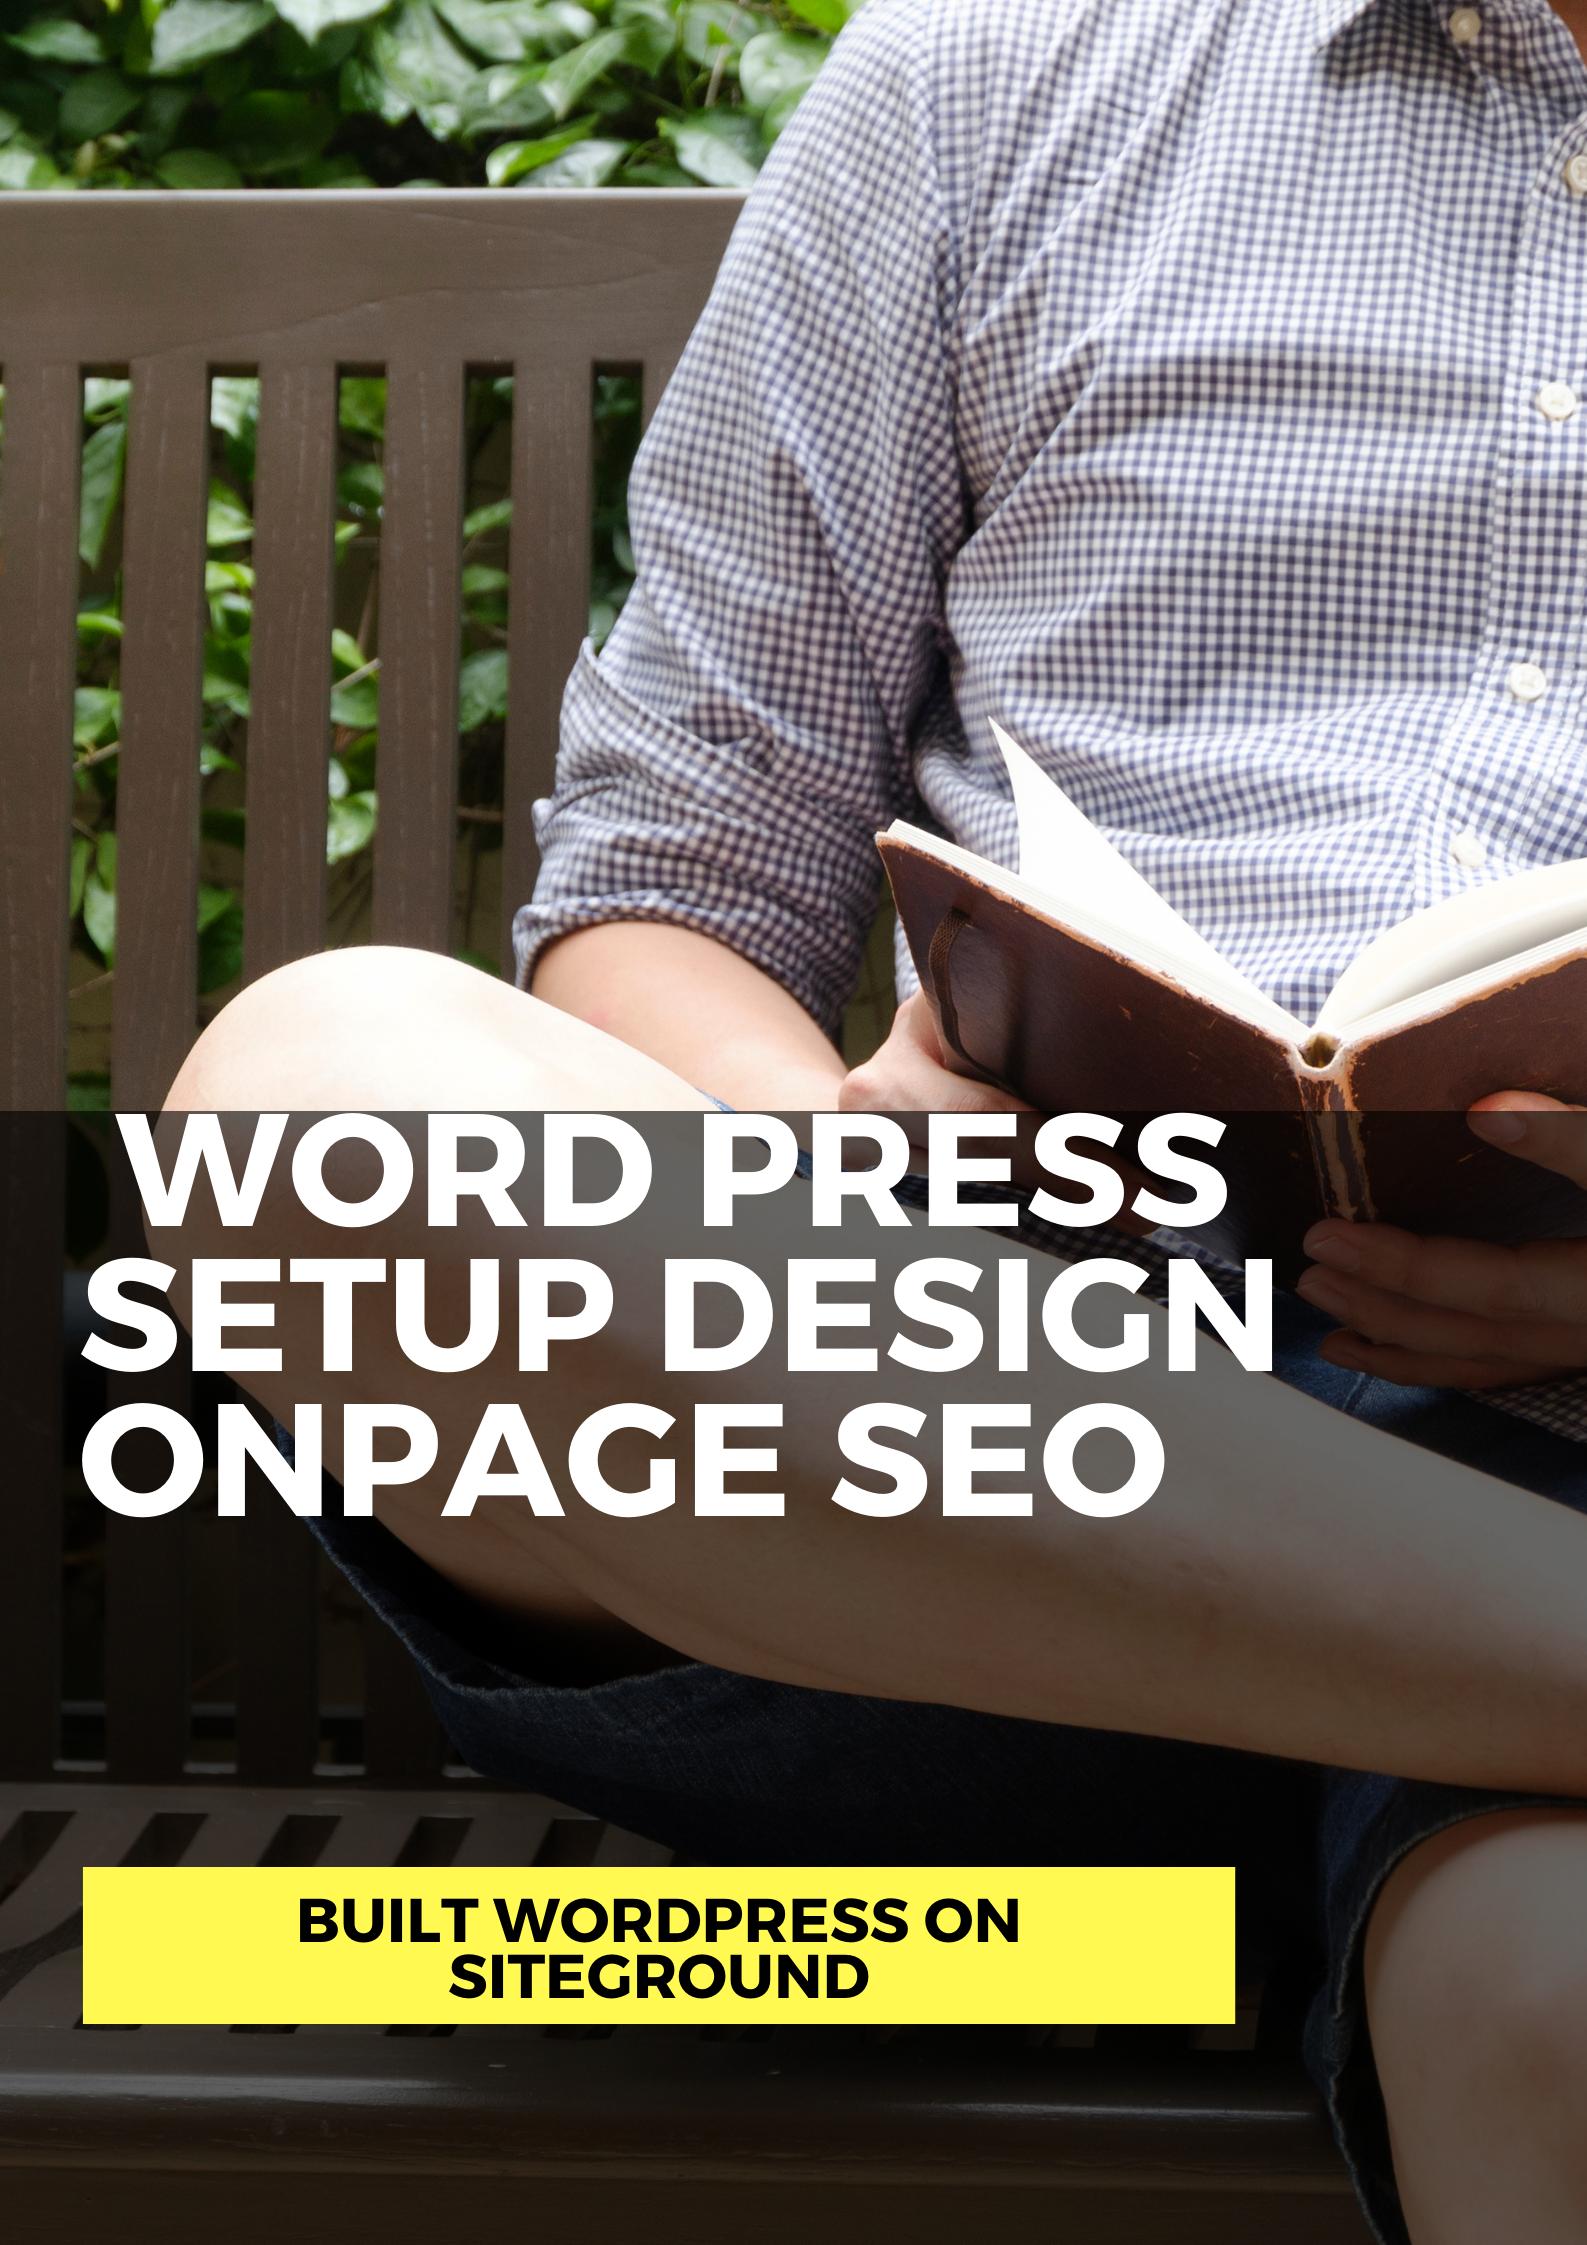 Design, setup and onpage seo wordpress